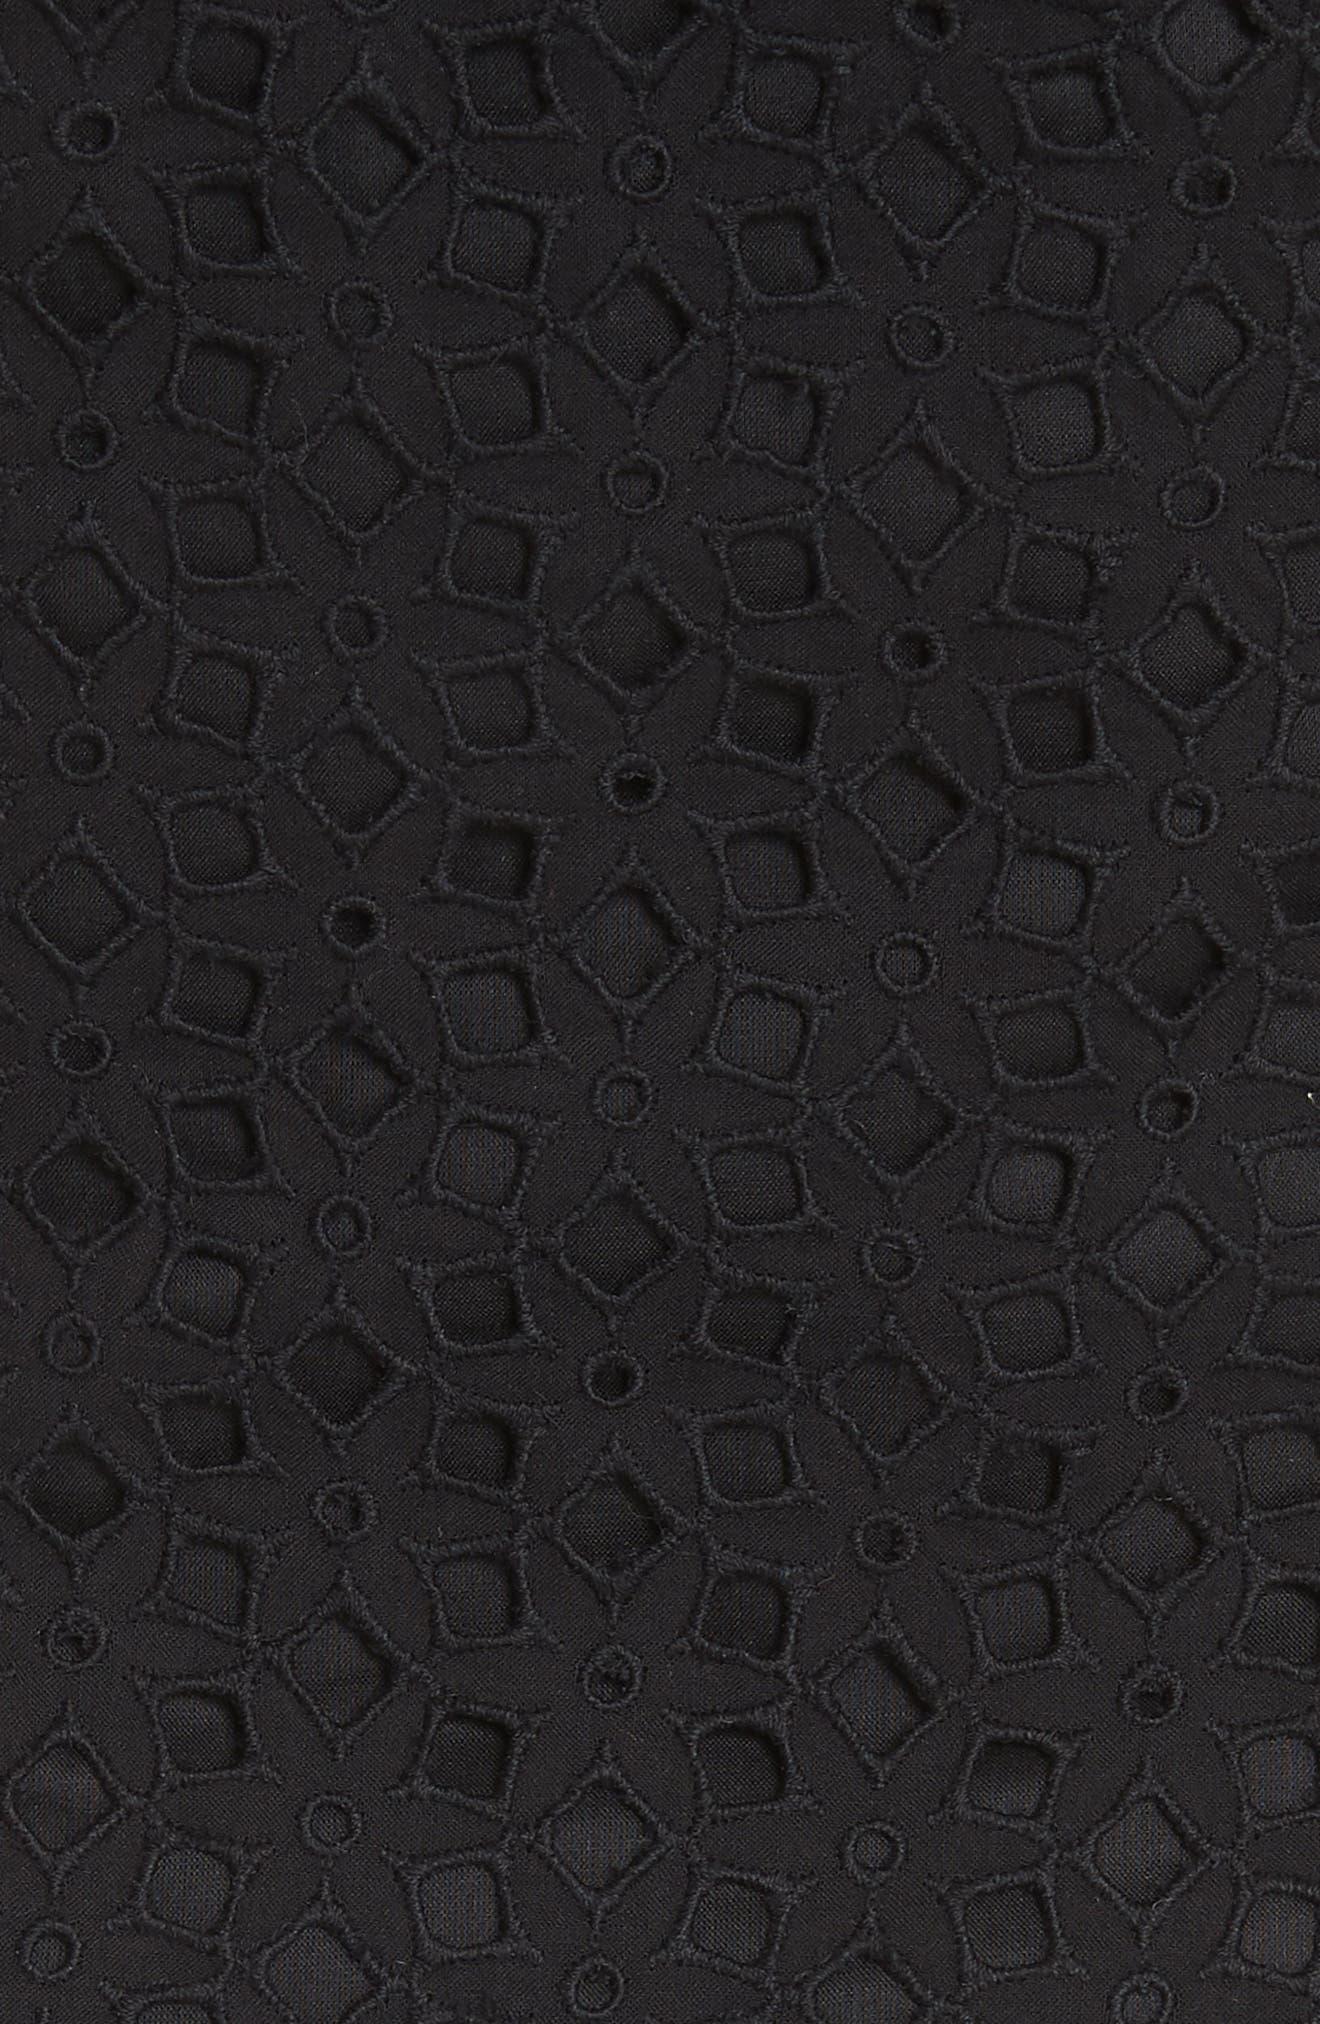 Karissa Floral Cotton Eyelet Bustier,                             Alternate thumbnail 5, color,                             Black